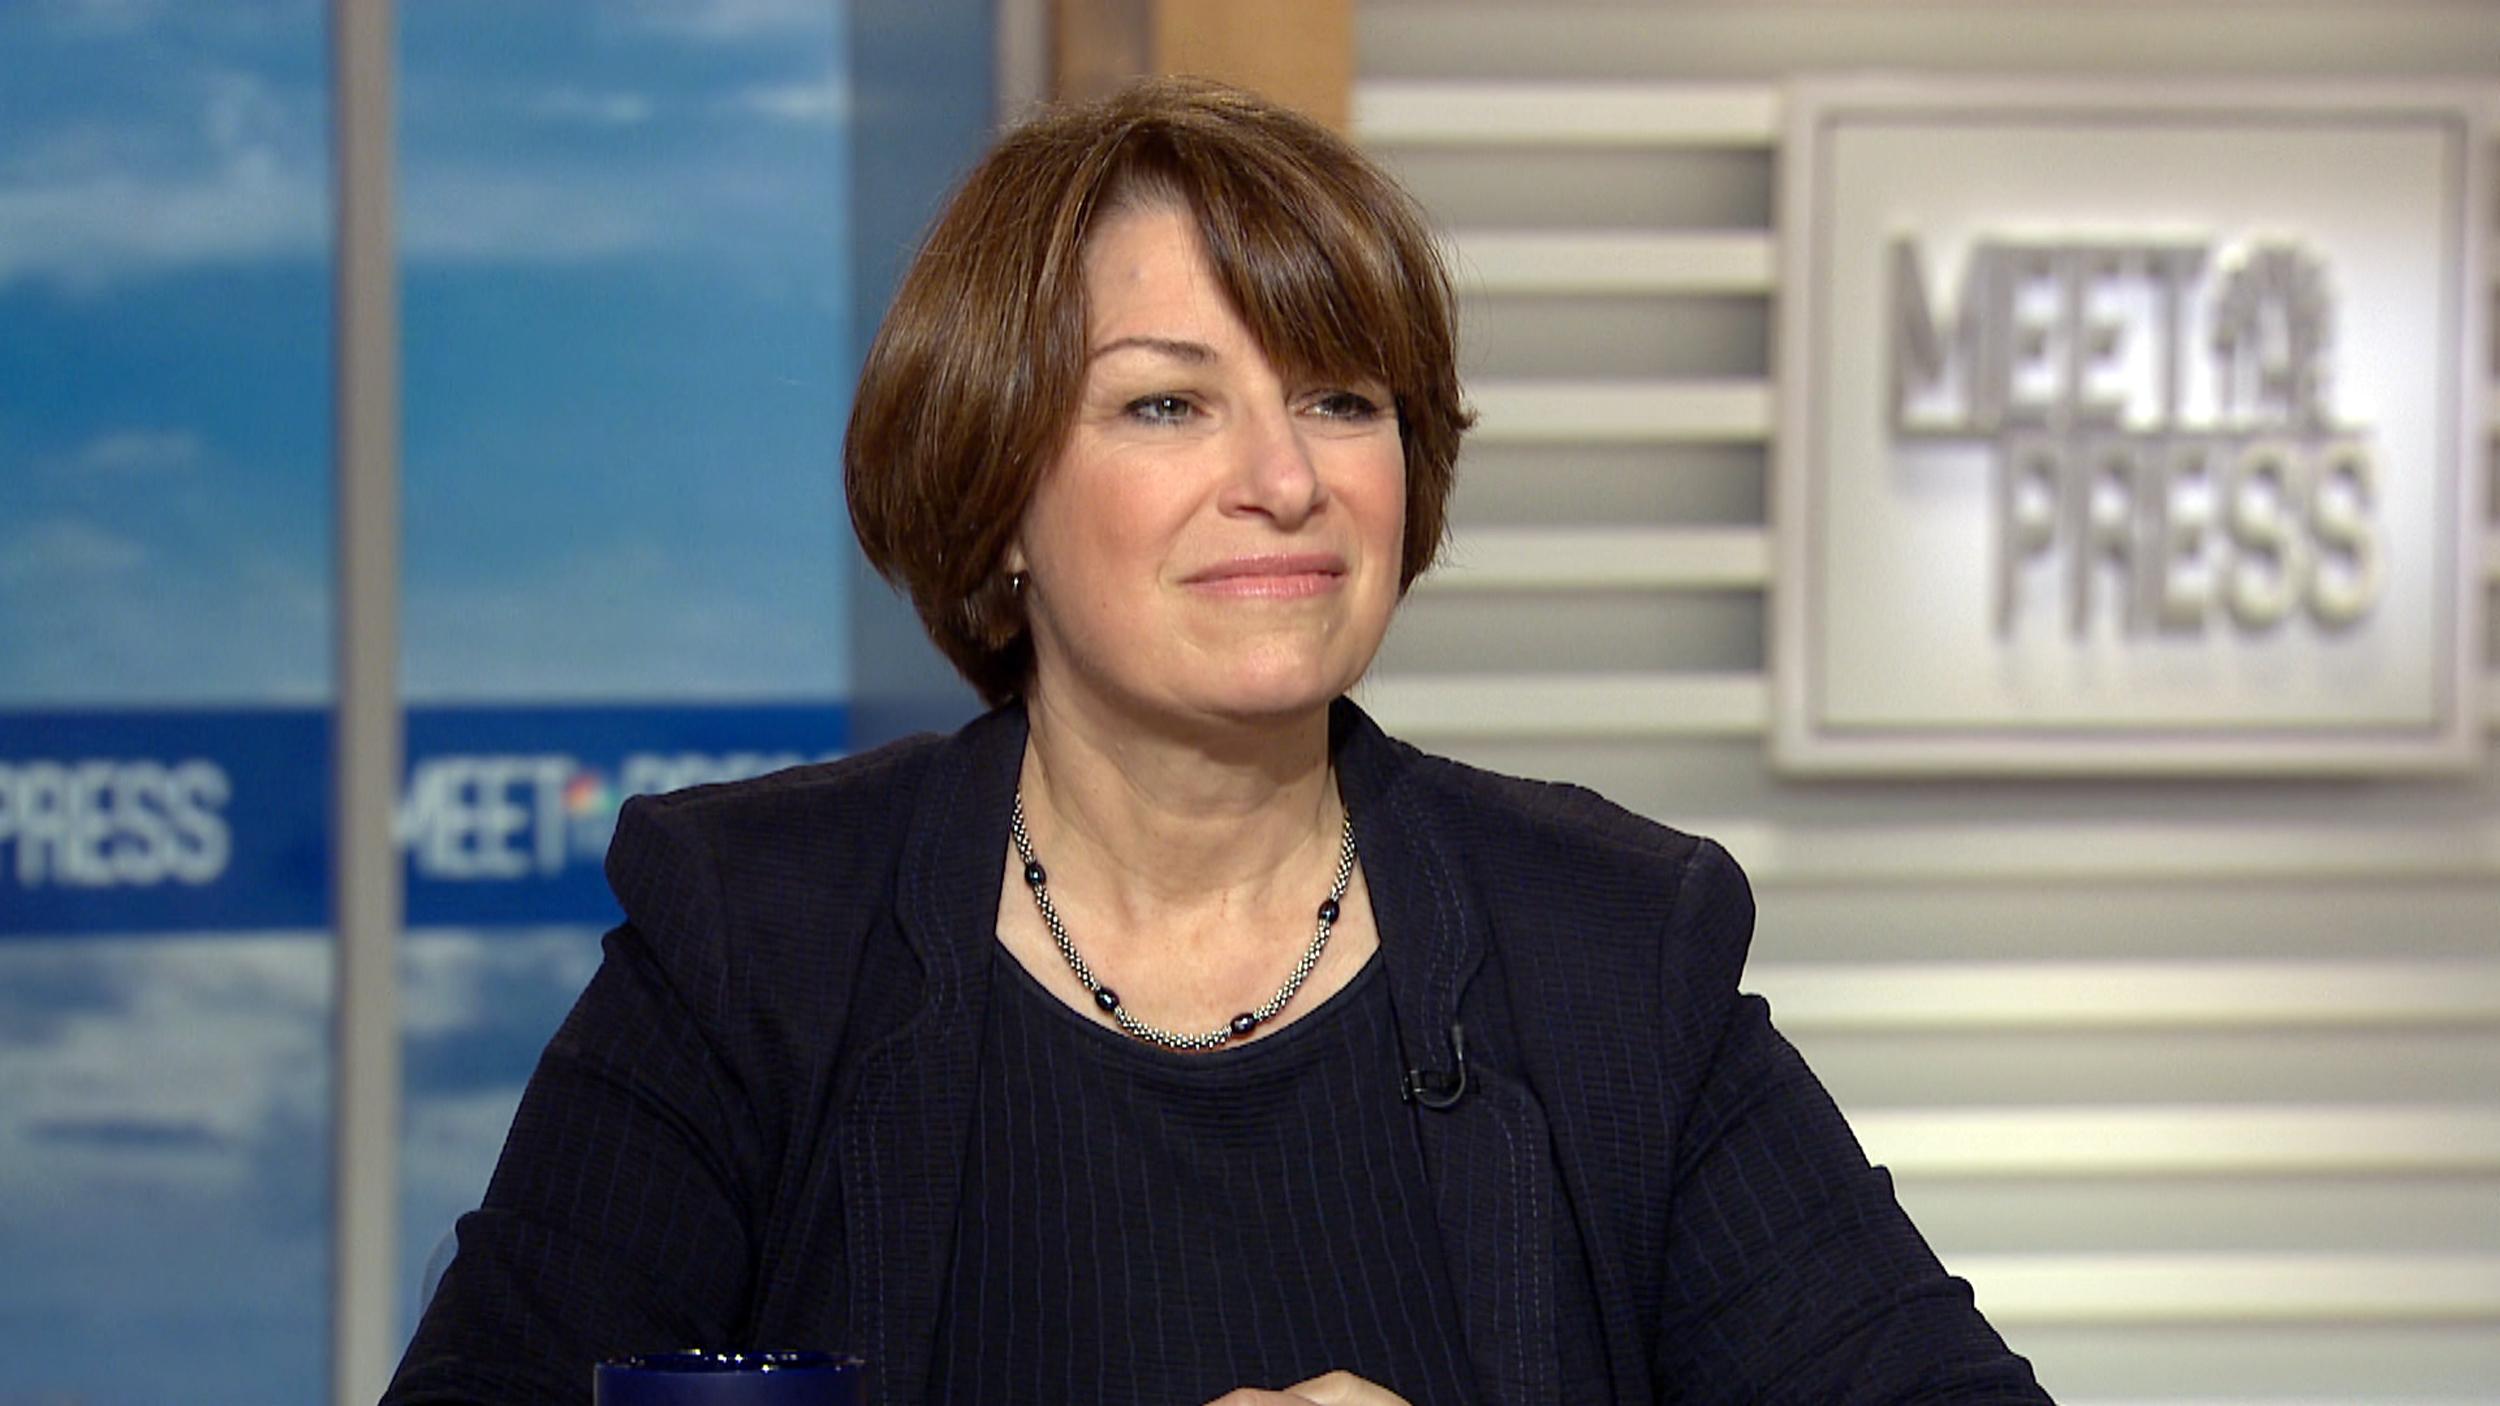 Senator Amy Klobuchar enters 2020 presidential race